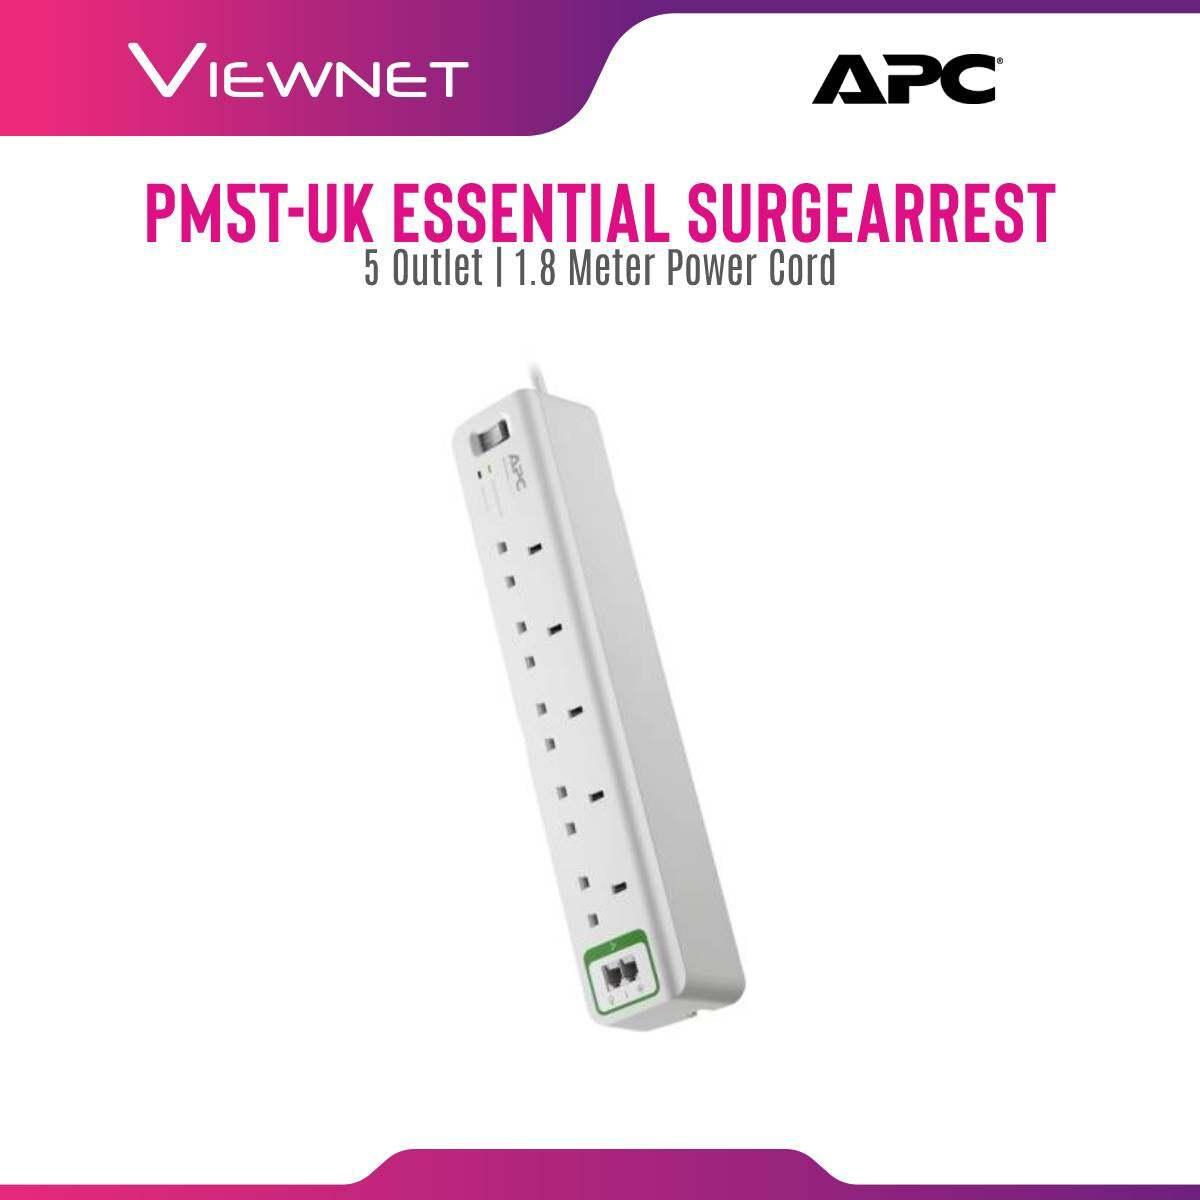 APC Essential SurgeArrest 5 outlets phone protection 230V UK PM5T-UK - White